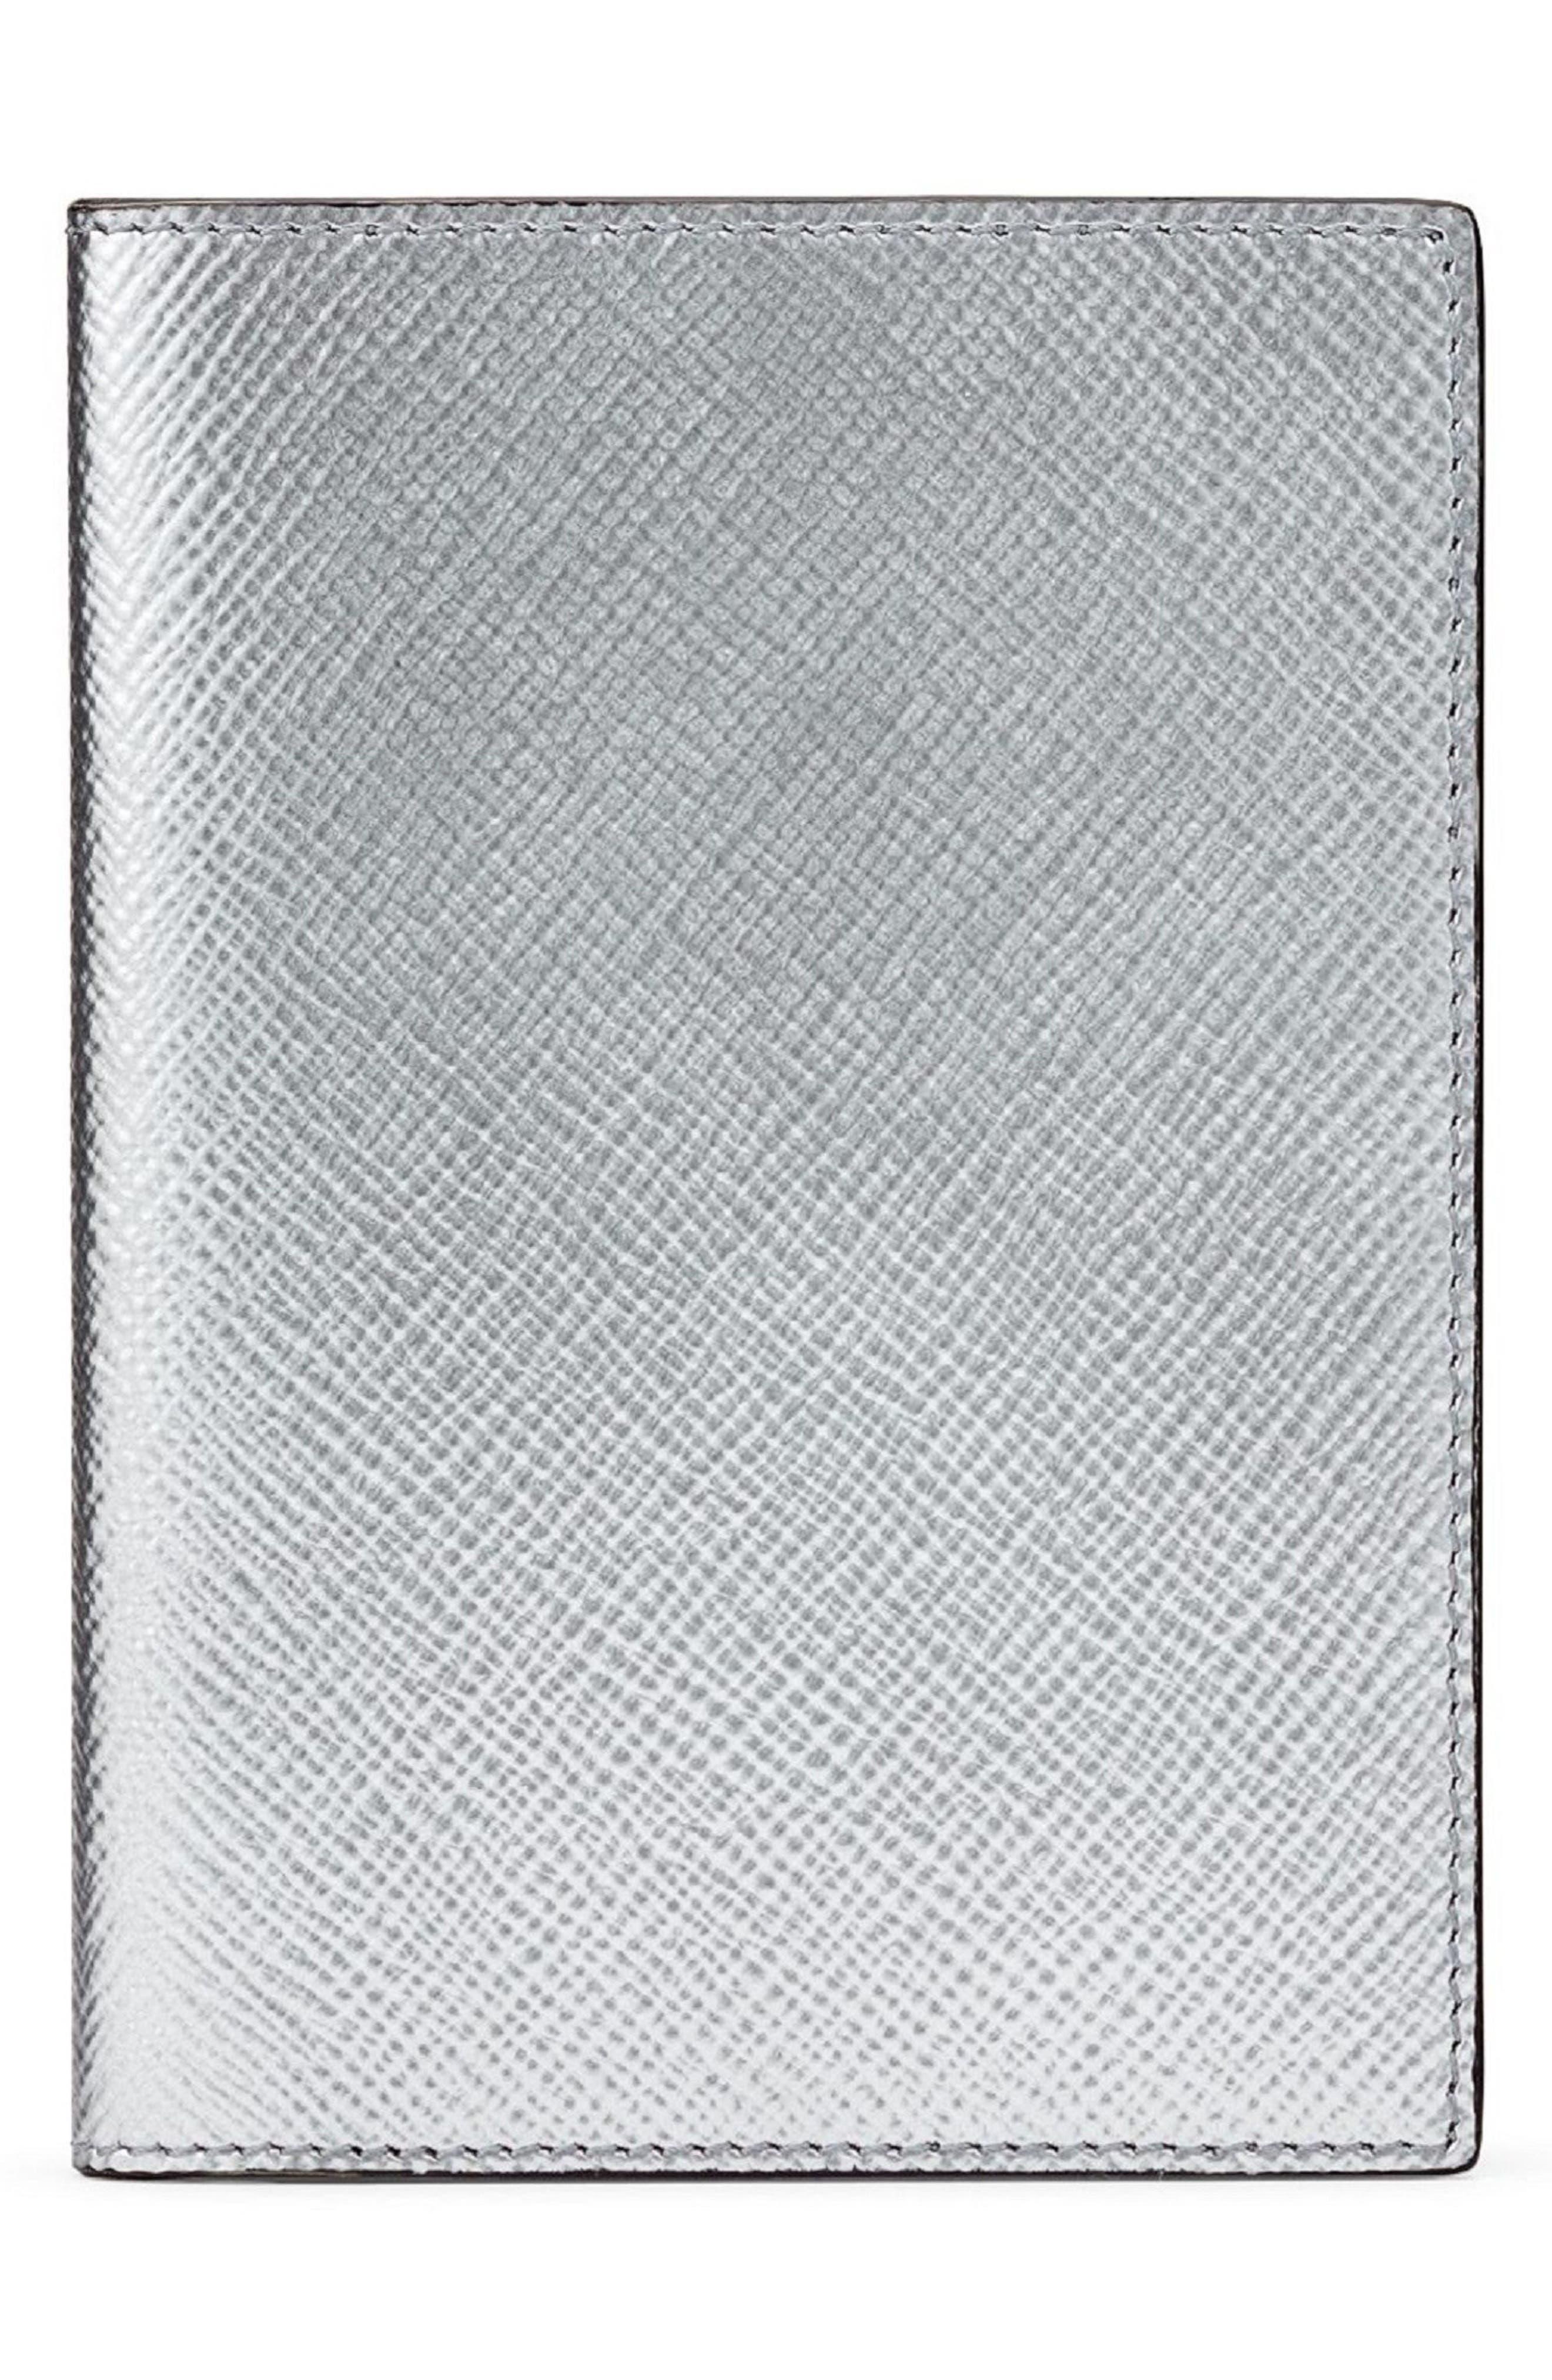 Panama Calfskin Leather Passport Case,                             Main thumbnail 1, color,                             Silver